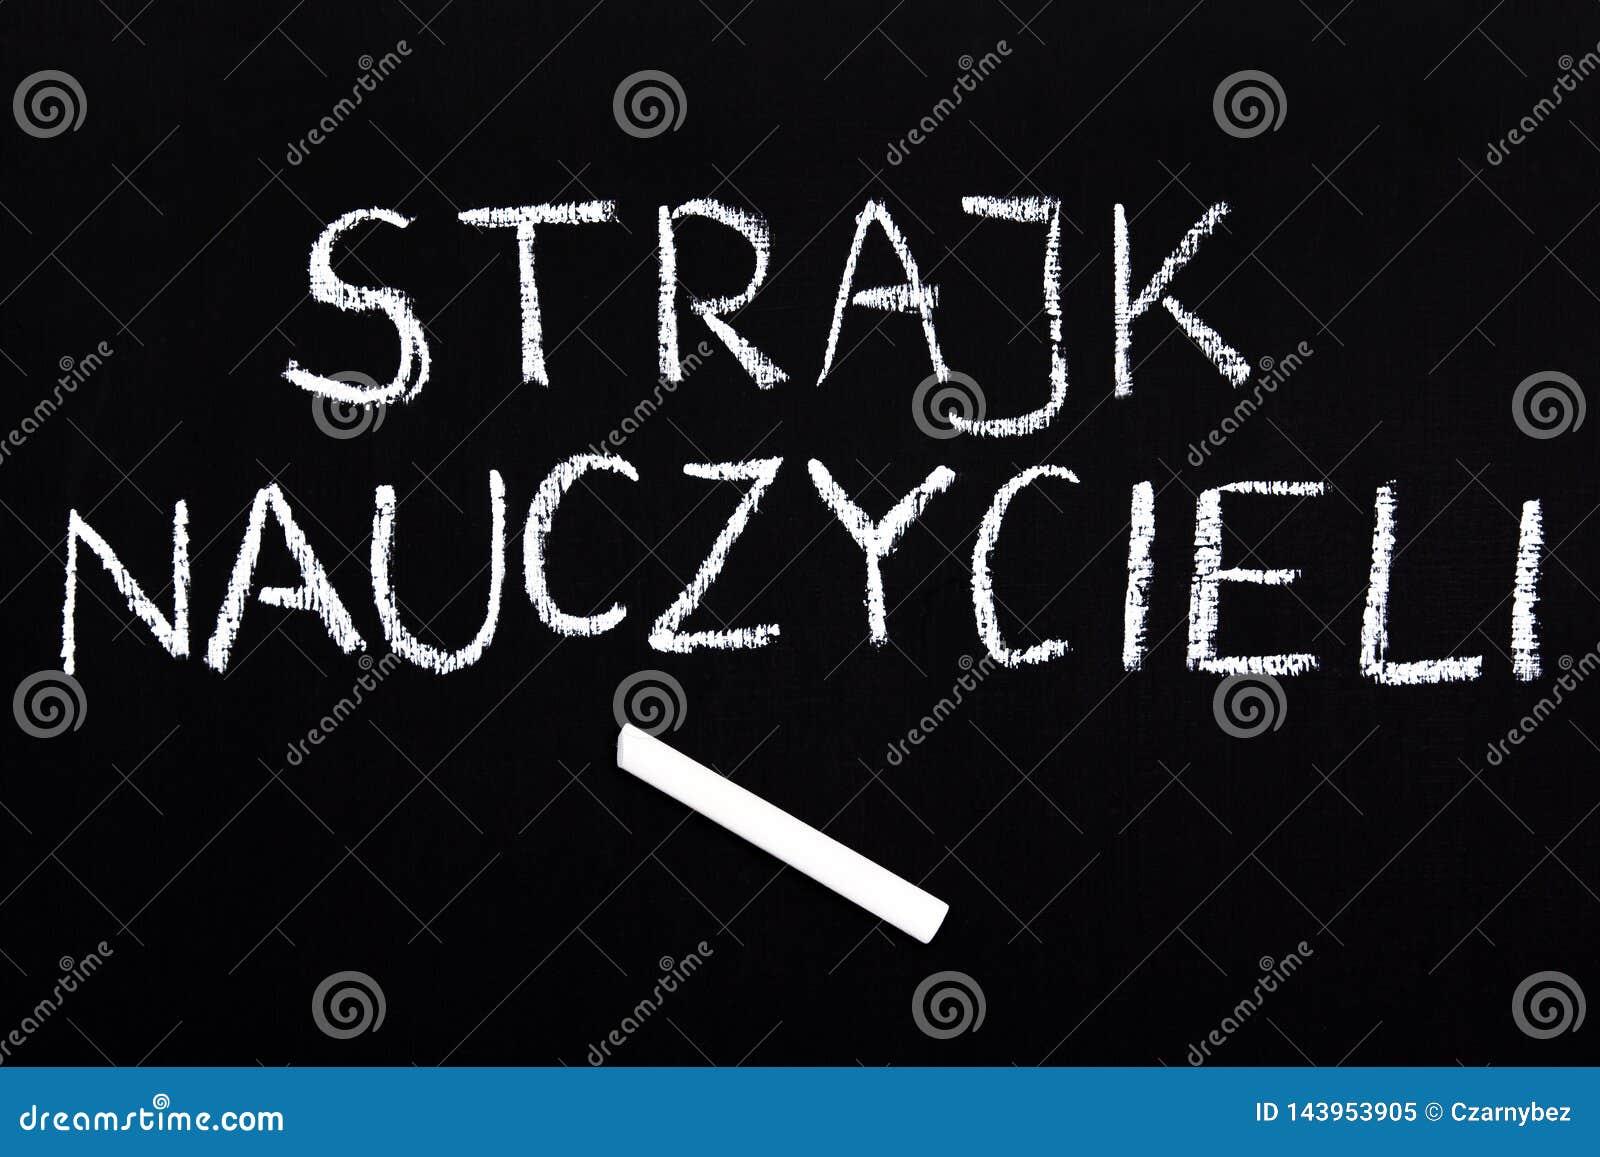 Polish word TEACHERS STRIKE on a chalkboard